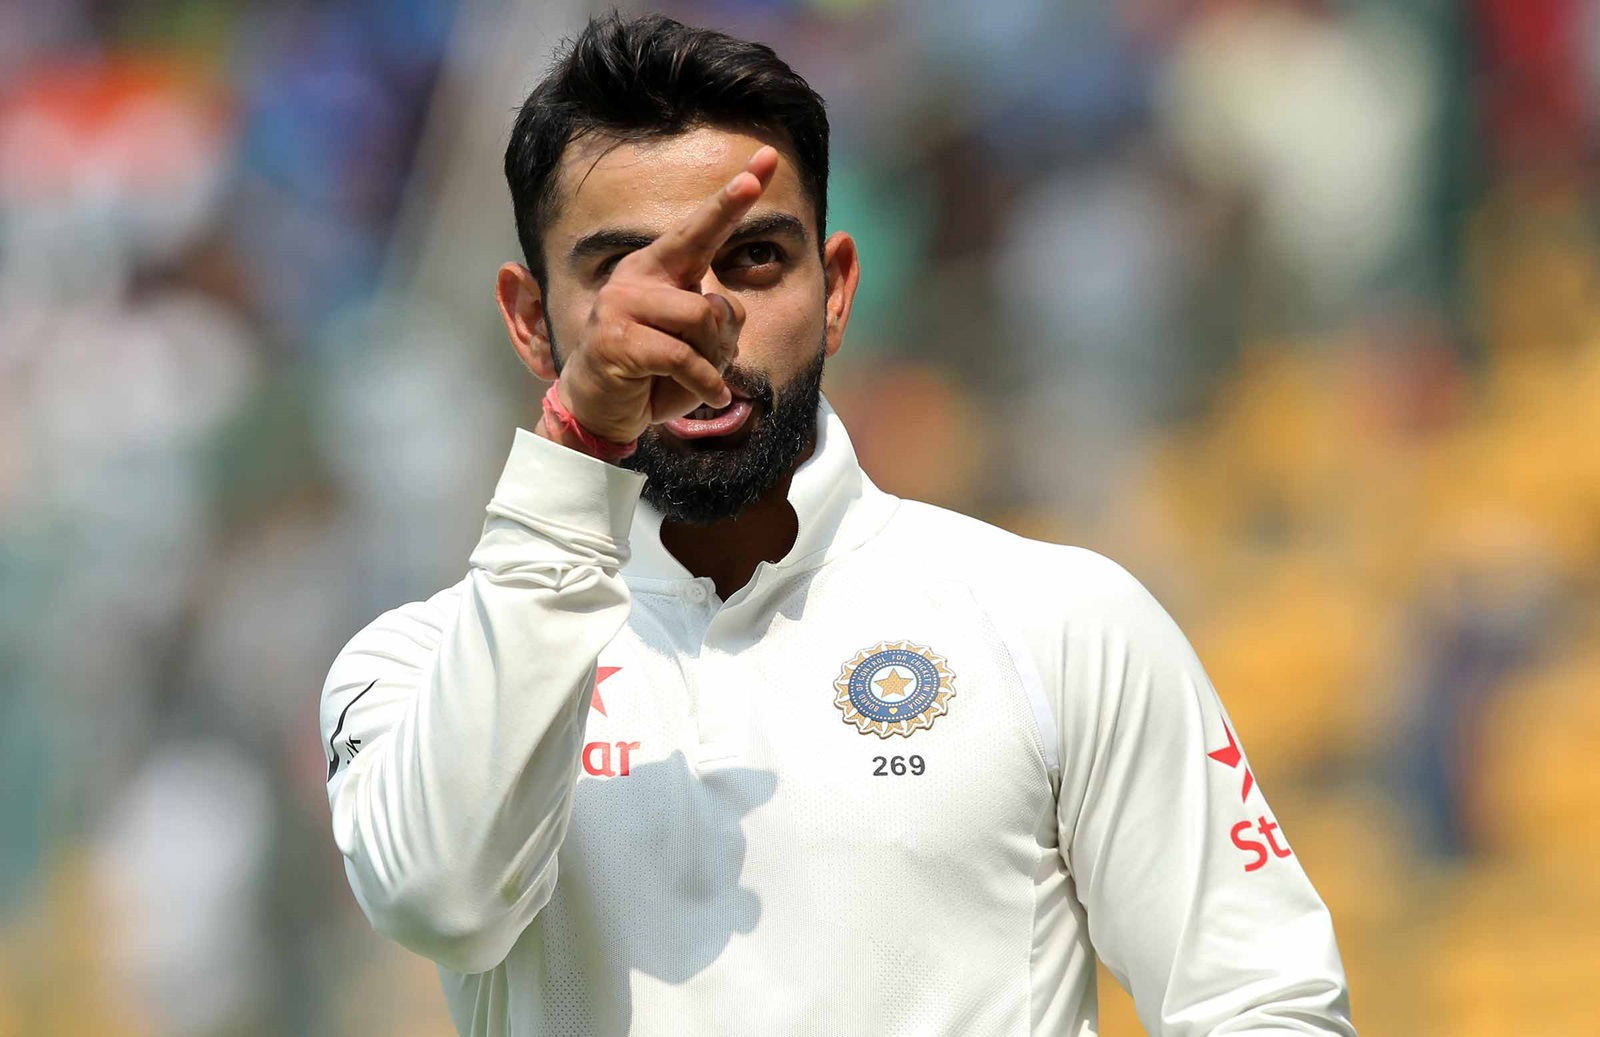 Cheating Kohli S Press Conference Inference Cricket Com Au